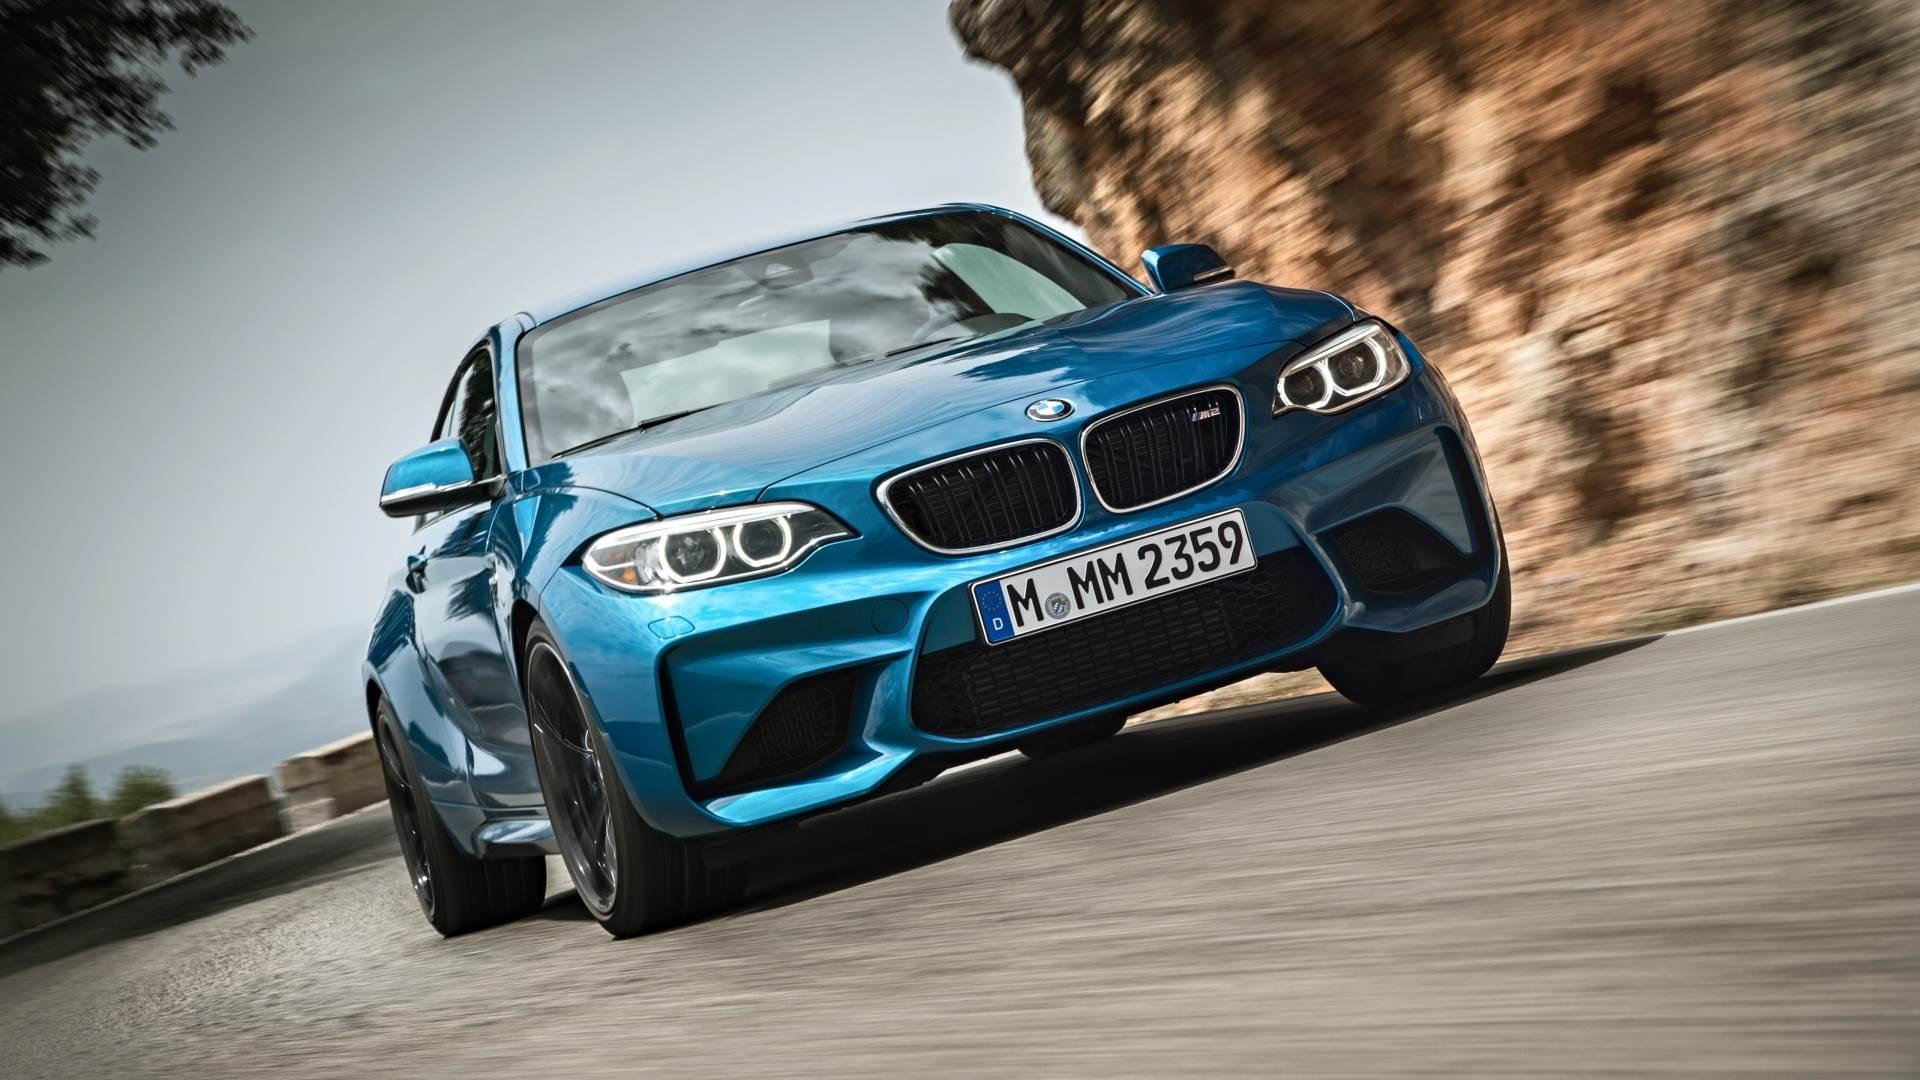 BMW M2 Front View Wallpaper